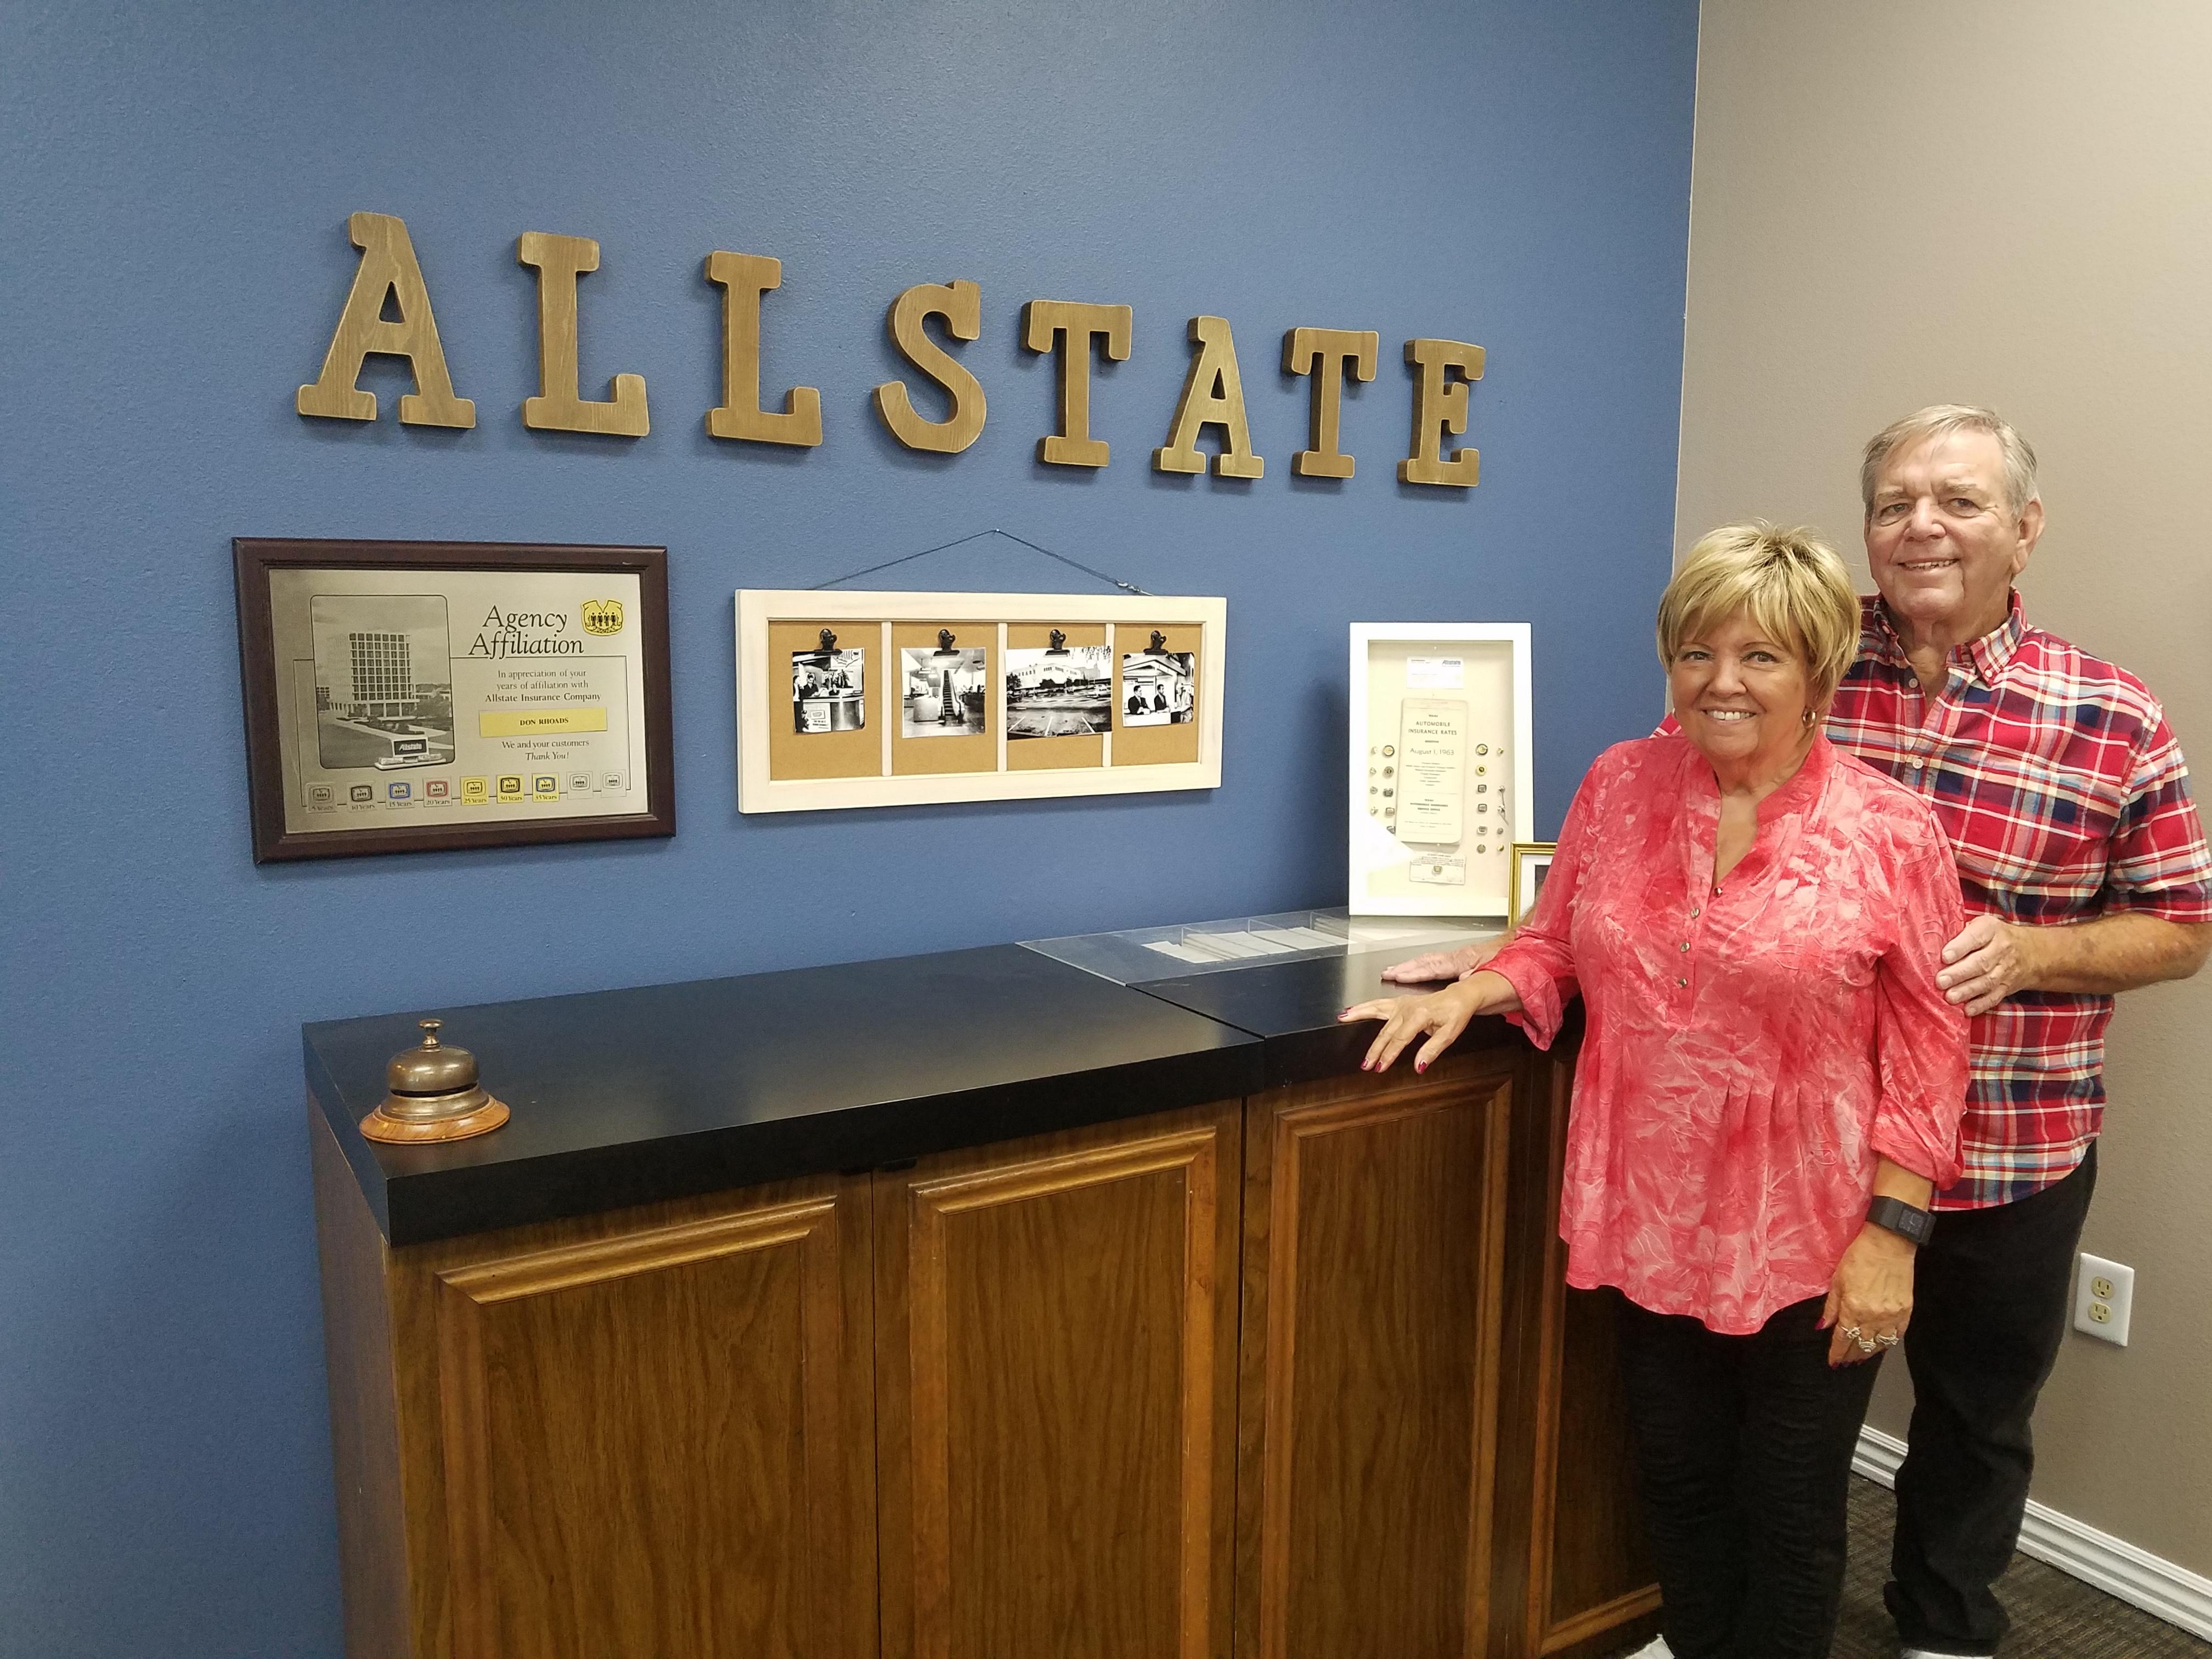 Leah Cheek: Allstate Insurance image 9